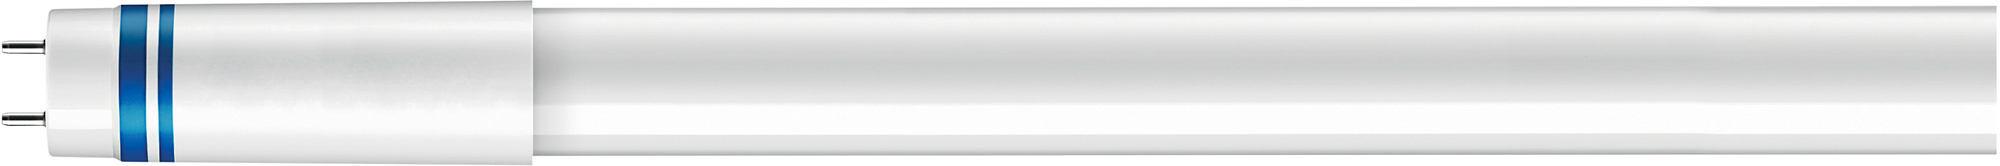 Philips MASTER LEDtube Value HF 1500mm 25W865 C ROT